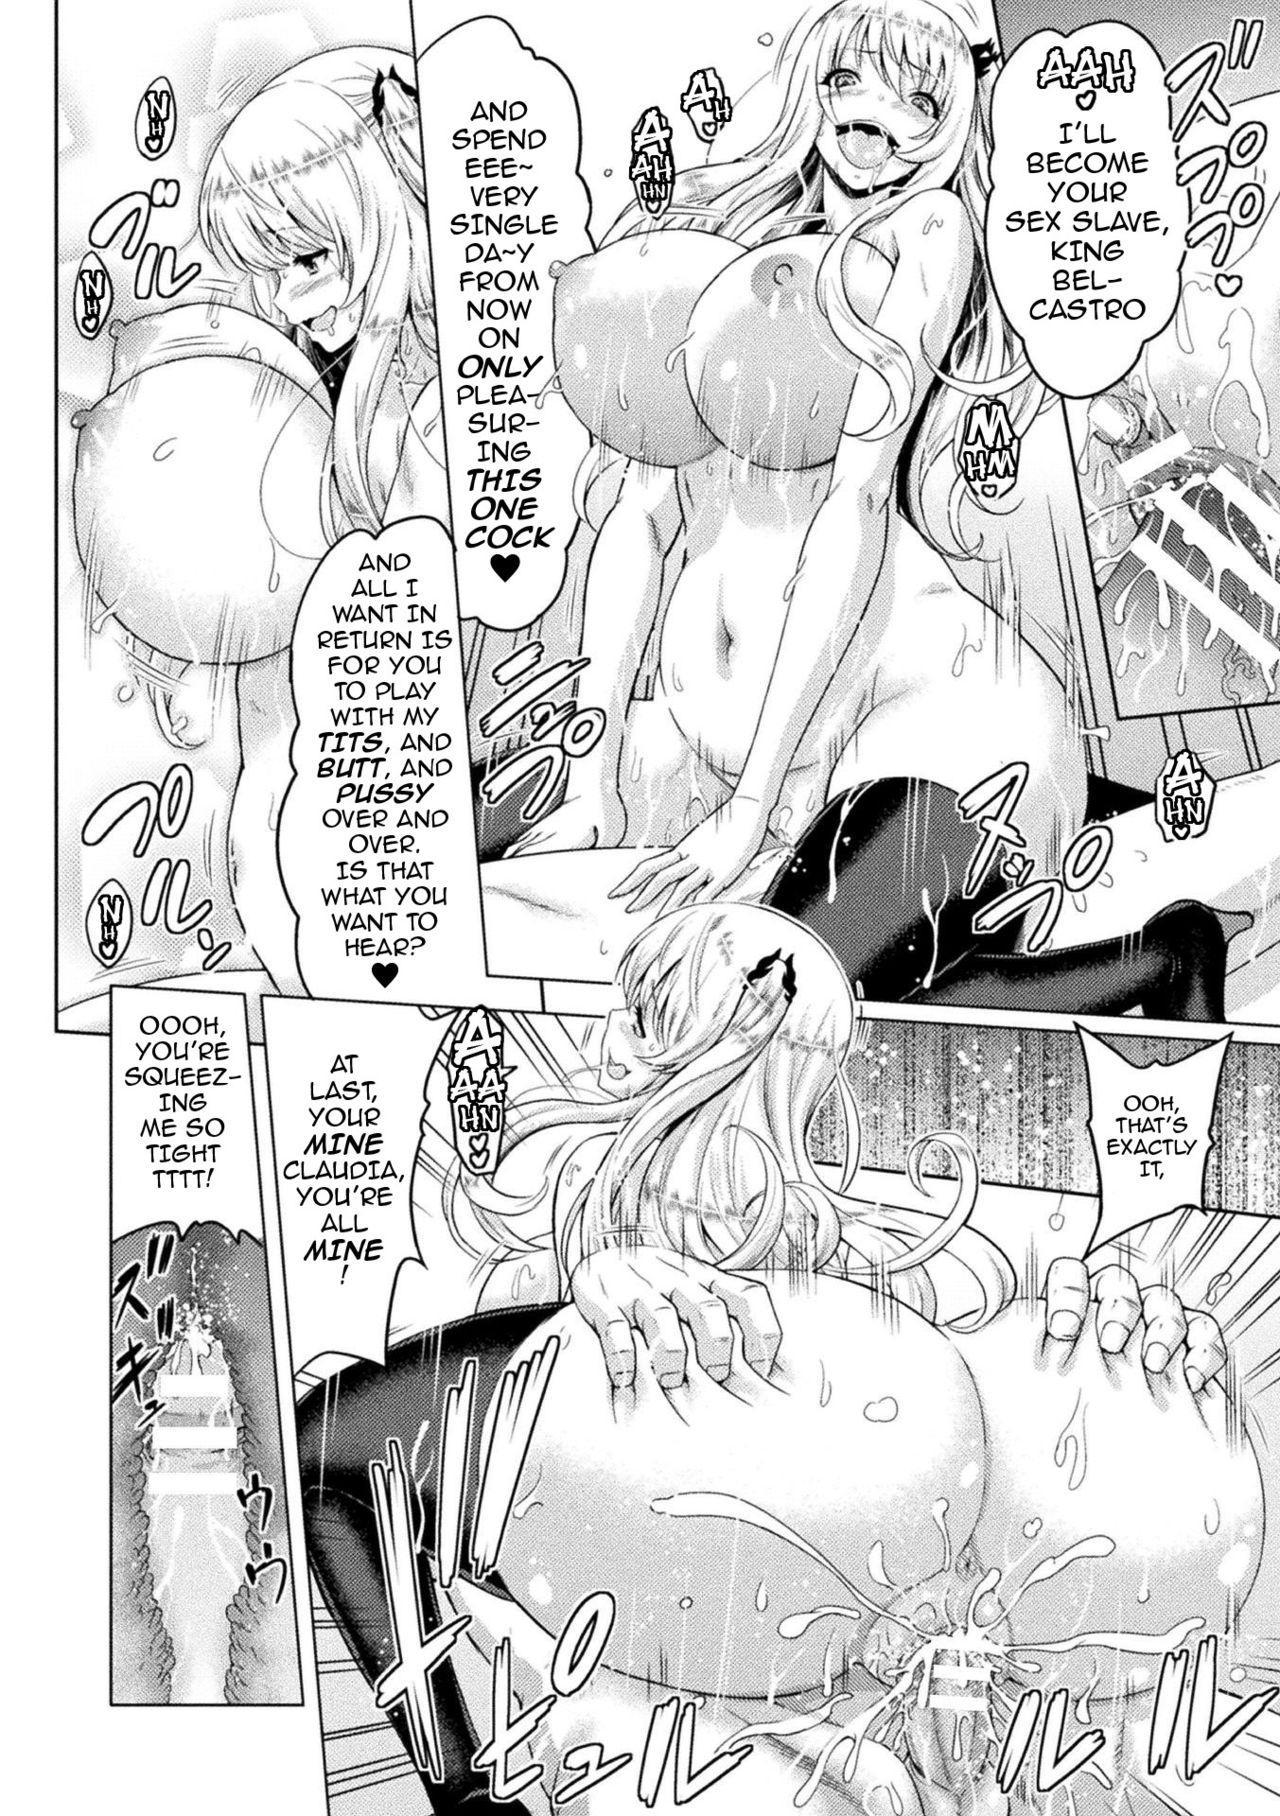 [Yamada Gogogo] Erona ~Orc no Inmon ni Okasareta Onna Kishi no Matsuro~ | Erona ~The Fall of a Beautiful Knight Cursed with the Lewd Mark of an Orc~ Ch. 1-5 [English] {darknight} 92